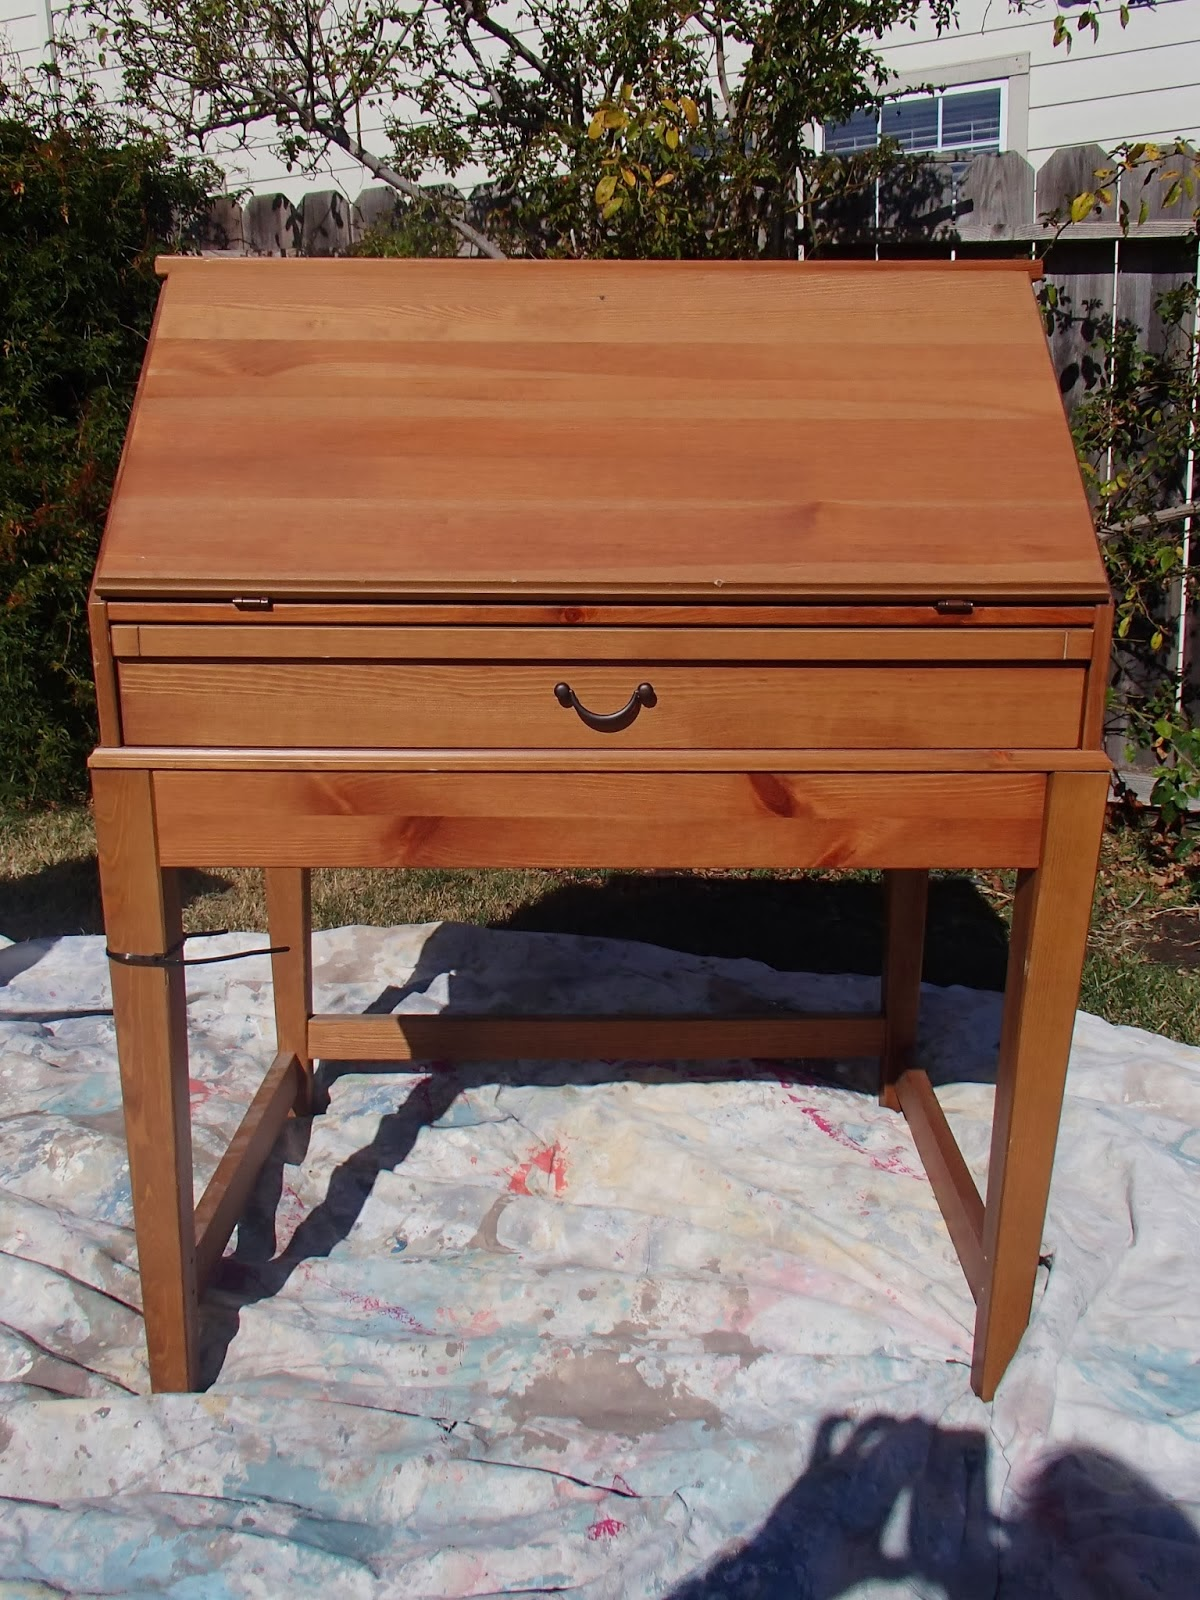 http://ddscottage.blogspot.com/2014/02/spring-green-secretary-desk_6.html